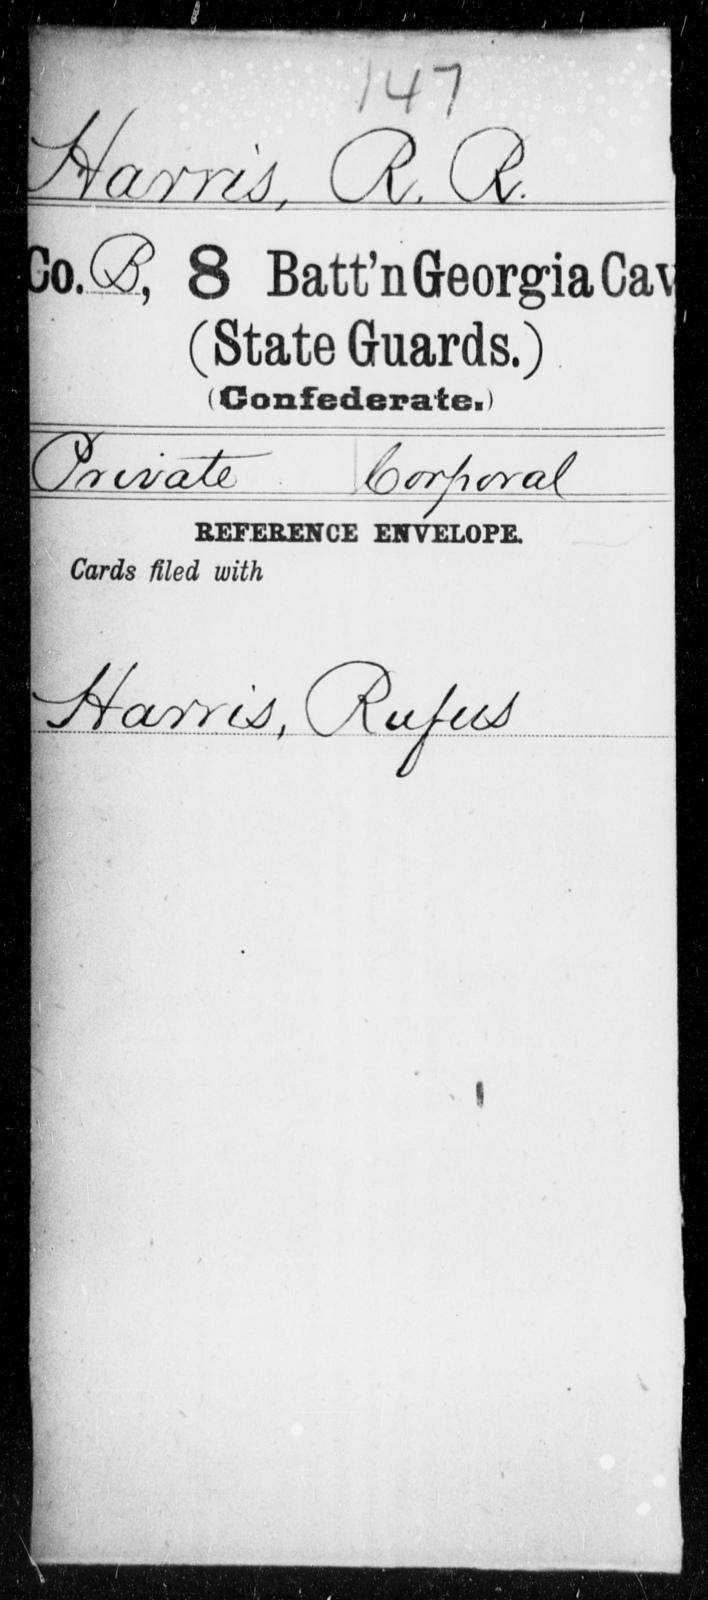 Harris, R R - 8th Battalion, Cavalry (State Guards) AND 9th Battalion, Cavalry (State Guards)